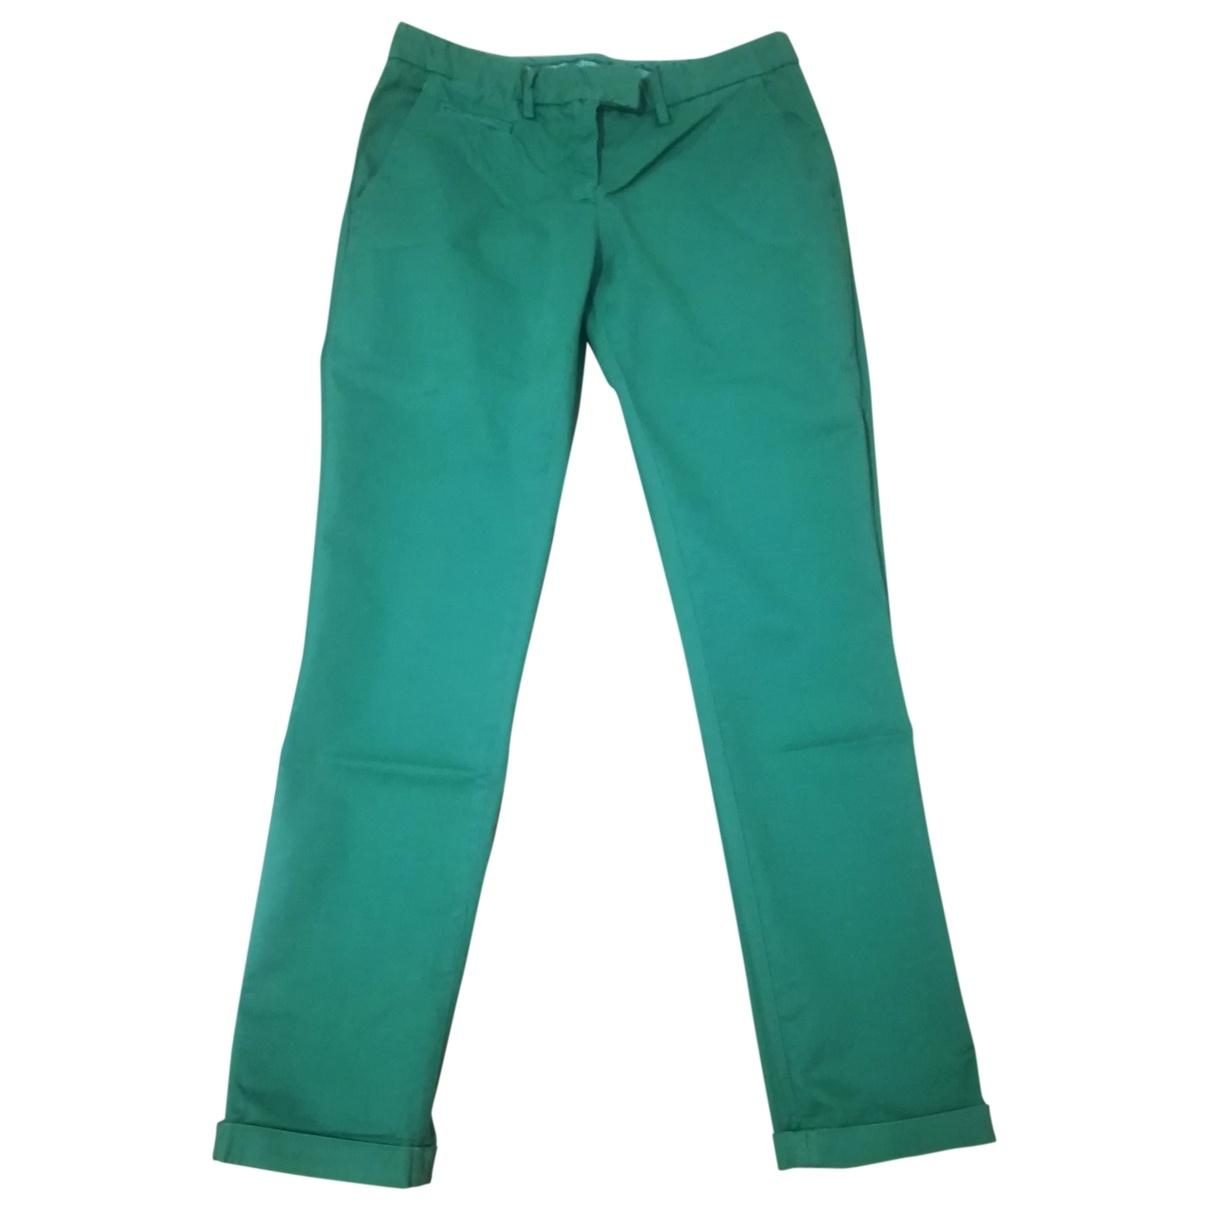 Patrizia Pepe - Pantalon   pour femme en coton - vert